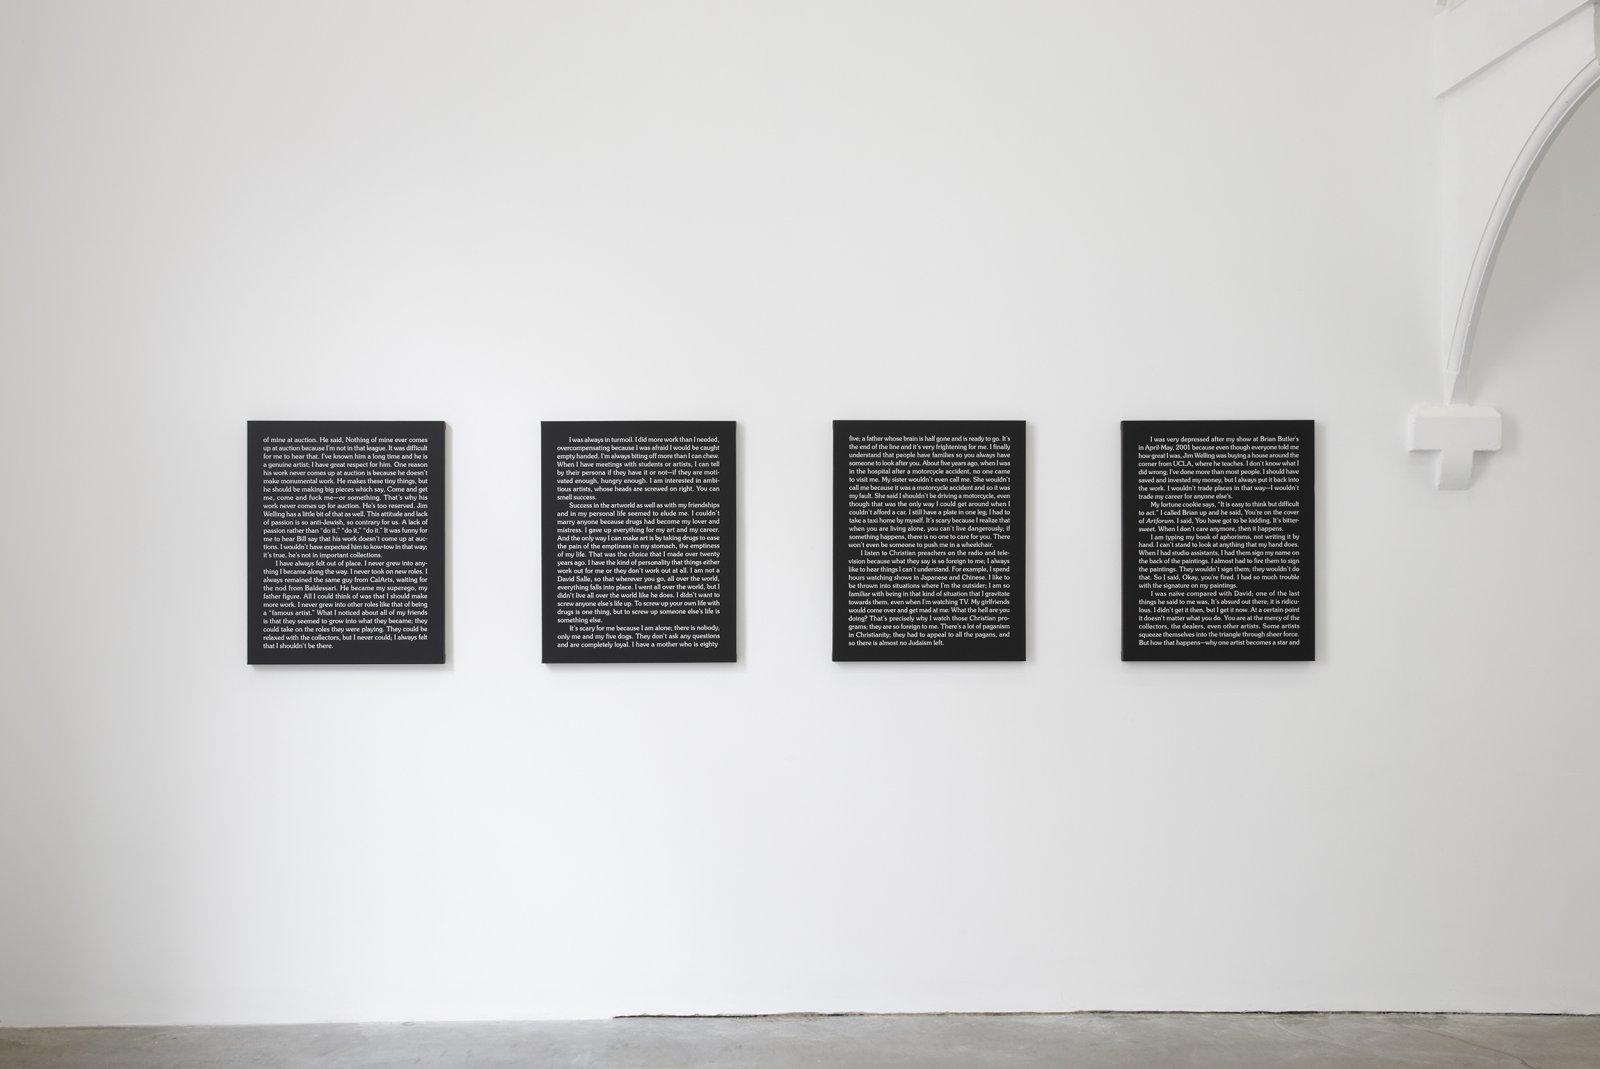 Ron Terada,Jack, 2010, acrylic on canvas, each30 x 24 in. (76 x 61 cm). Installation view,Who I Think I Am, Ikon Gallery, Birmingham, UK, 2010